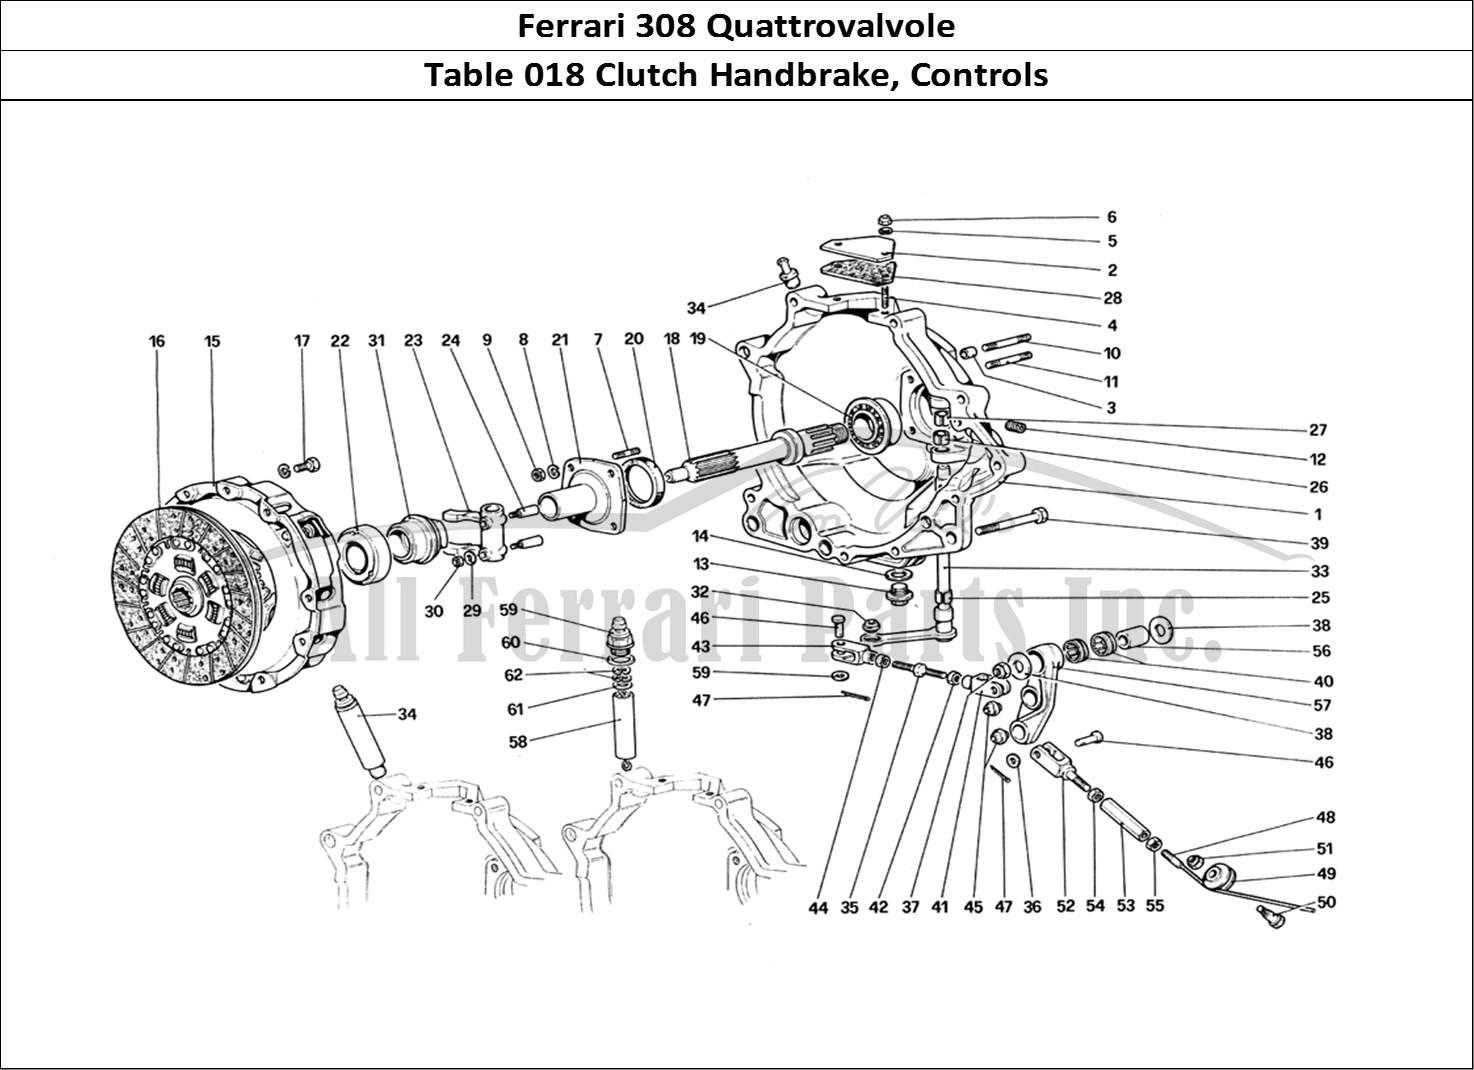 Buy Original Ferrari 308 Quattrovalvole 018 Clutch Handbrake Controls Ferrari Parts Spares